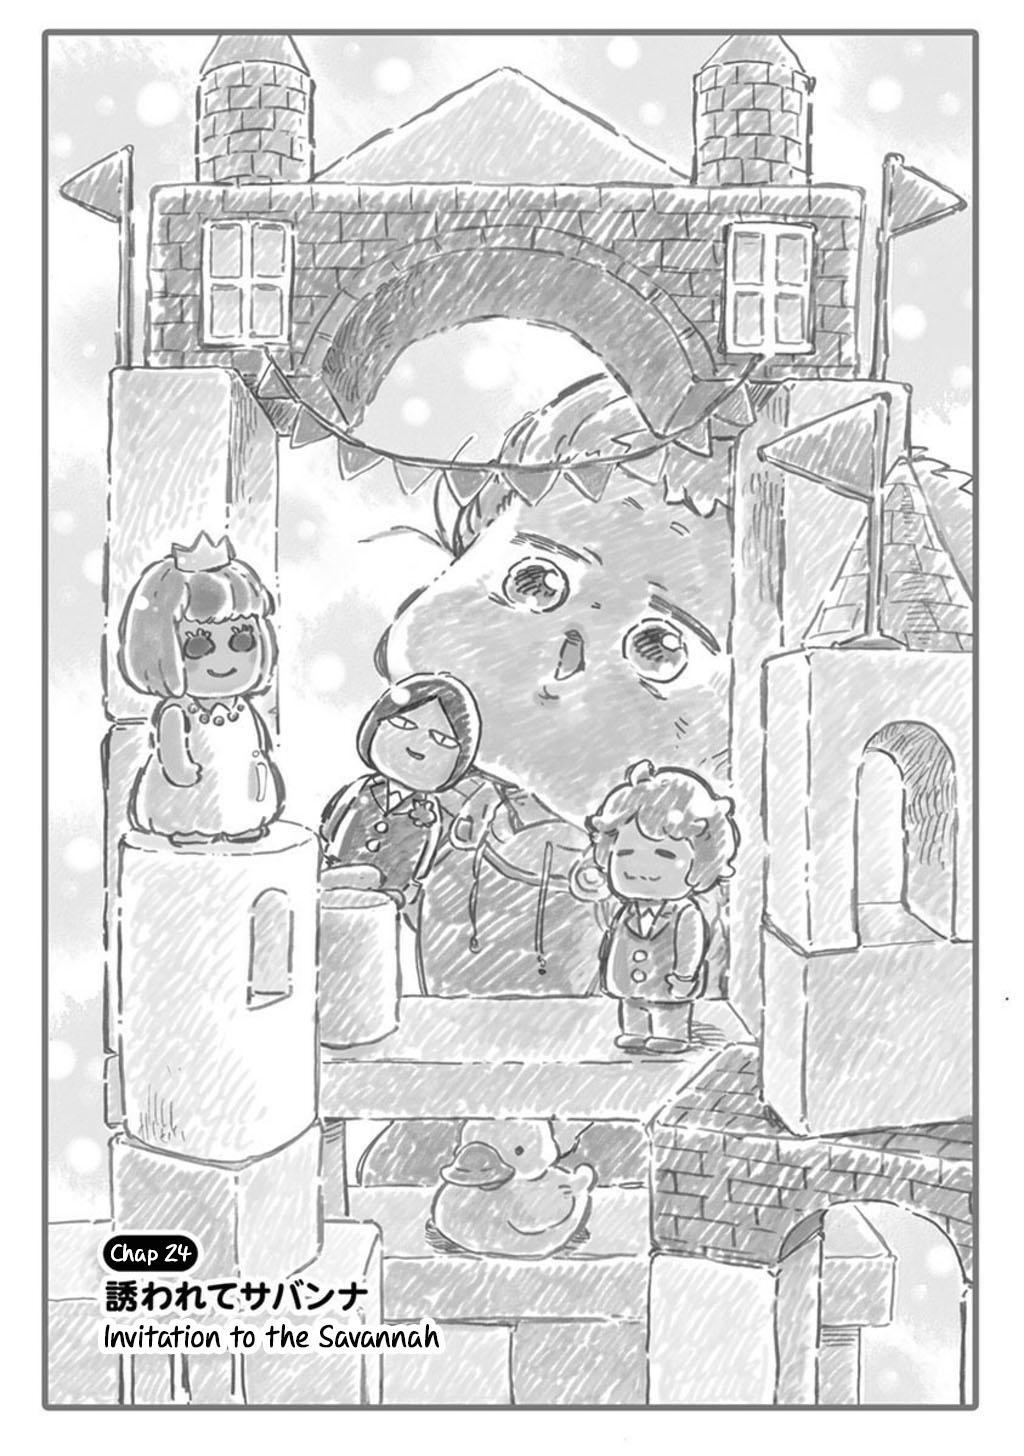 https://img2.nineanime.com/comics/pic2/46/12526/614229/e6878291ad56613c5944263526439829.jpg Page 1